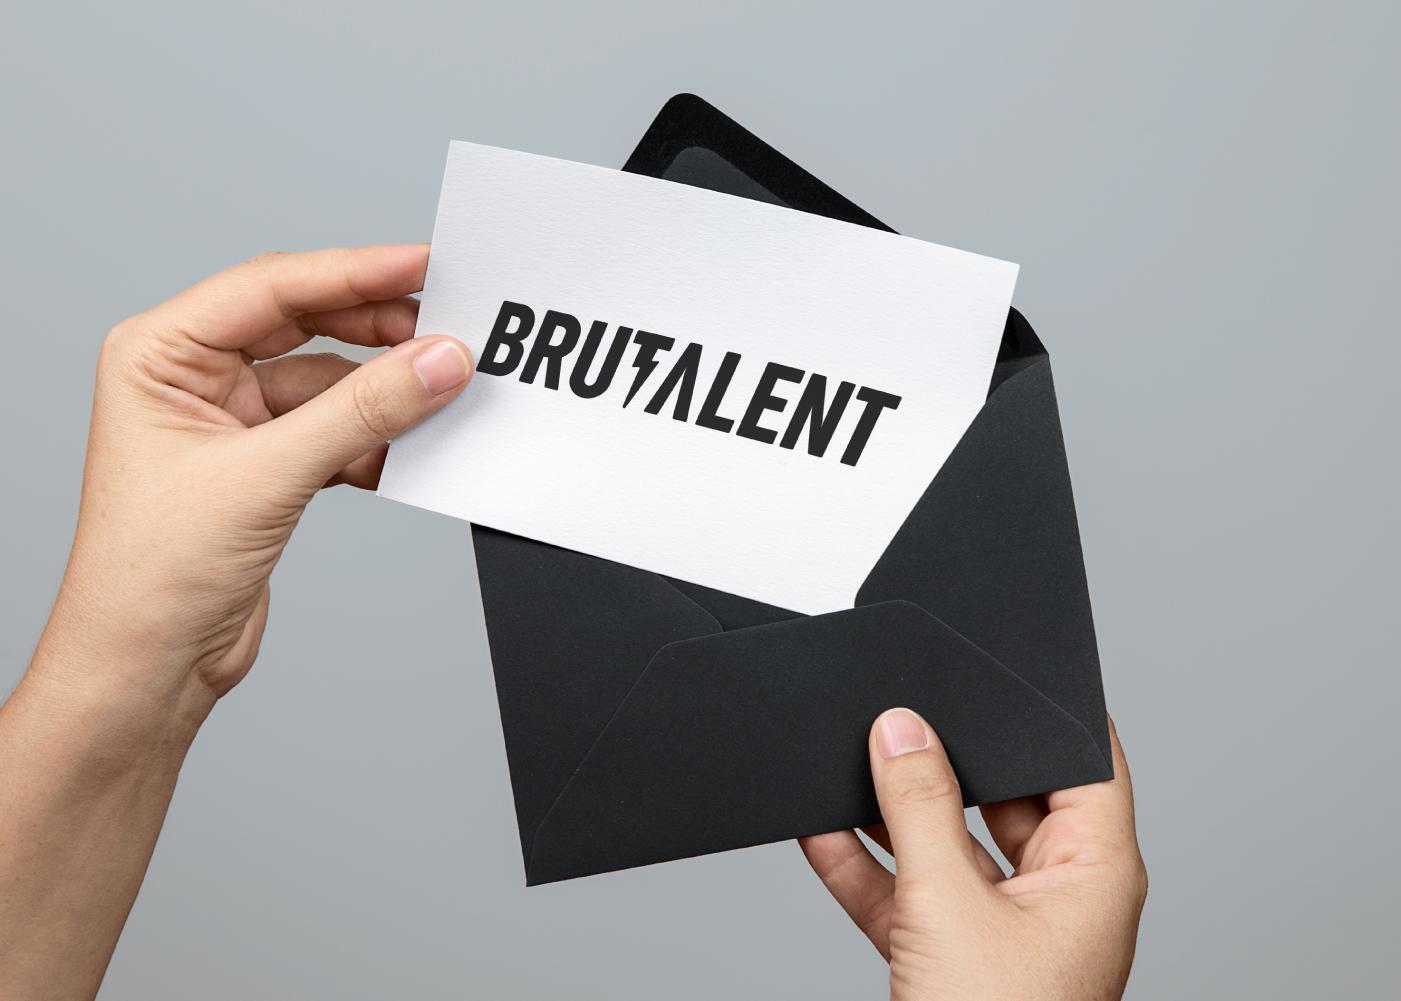 brutalent-card-tarjeta-sobre-logo